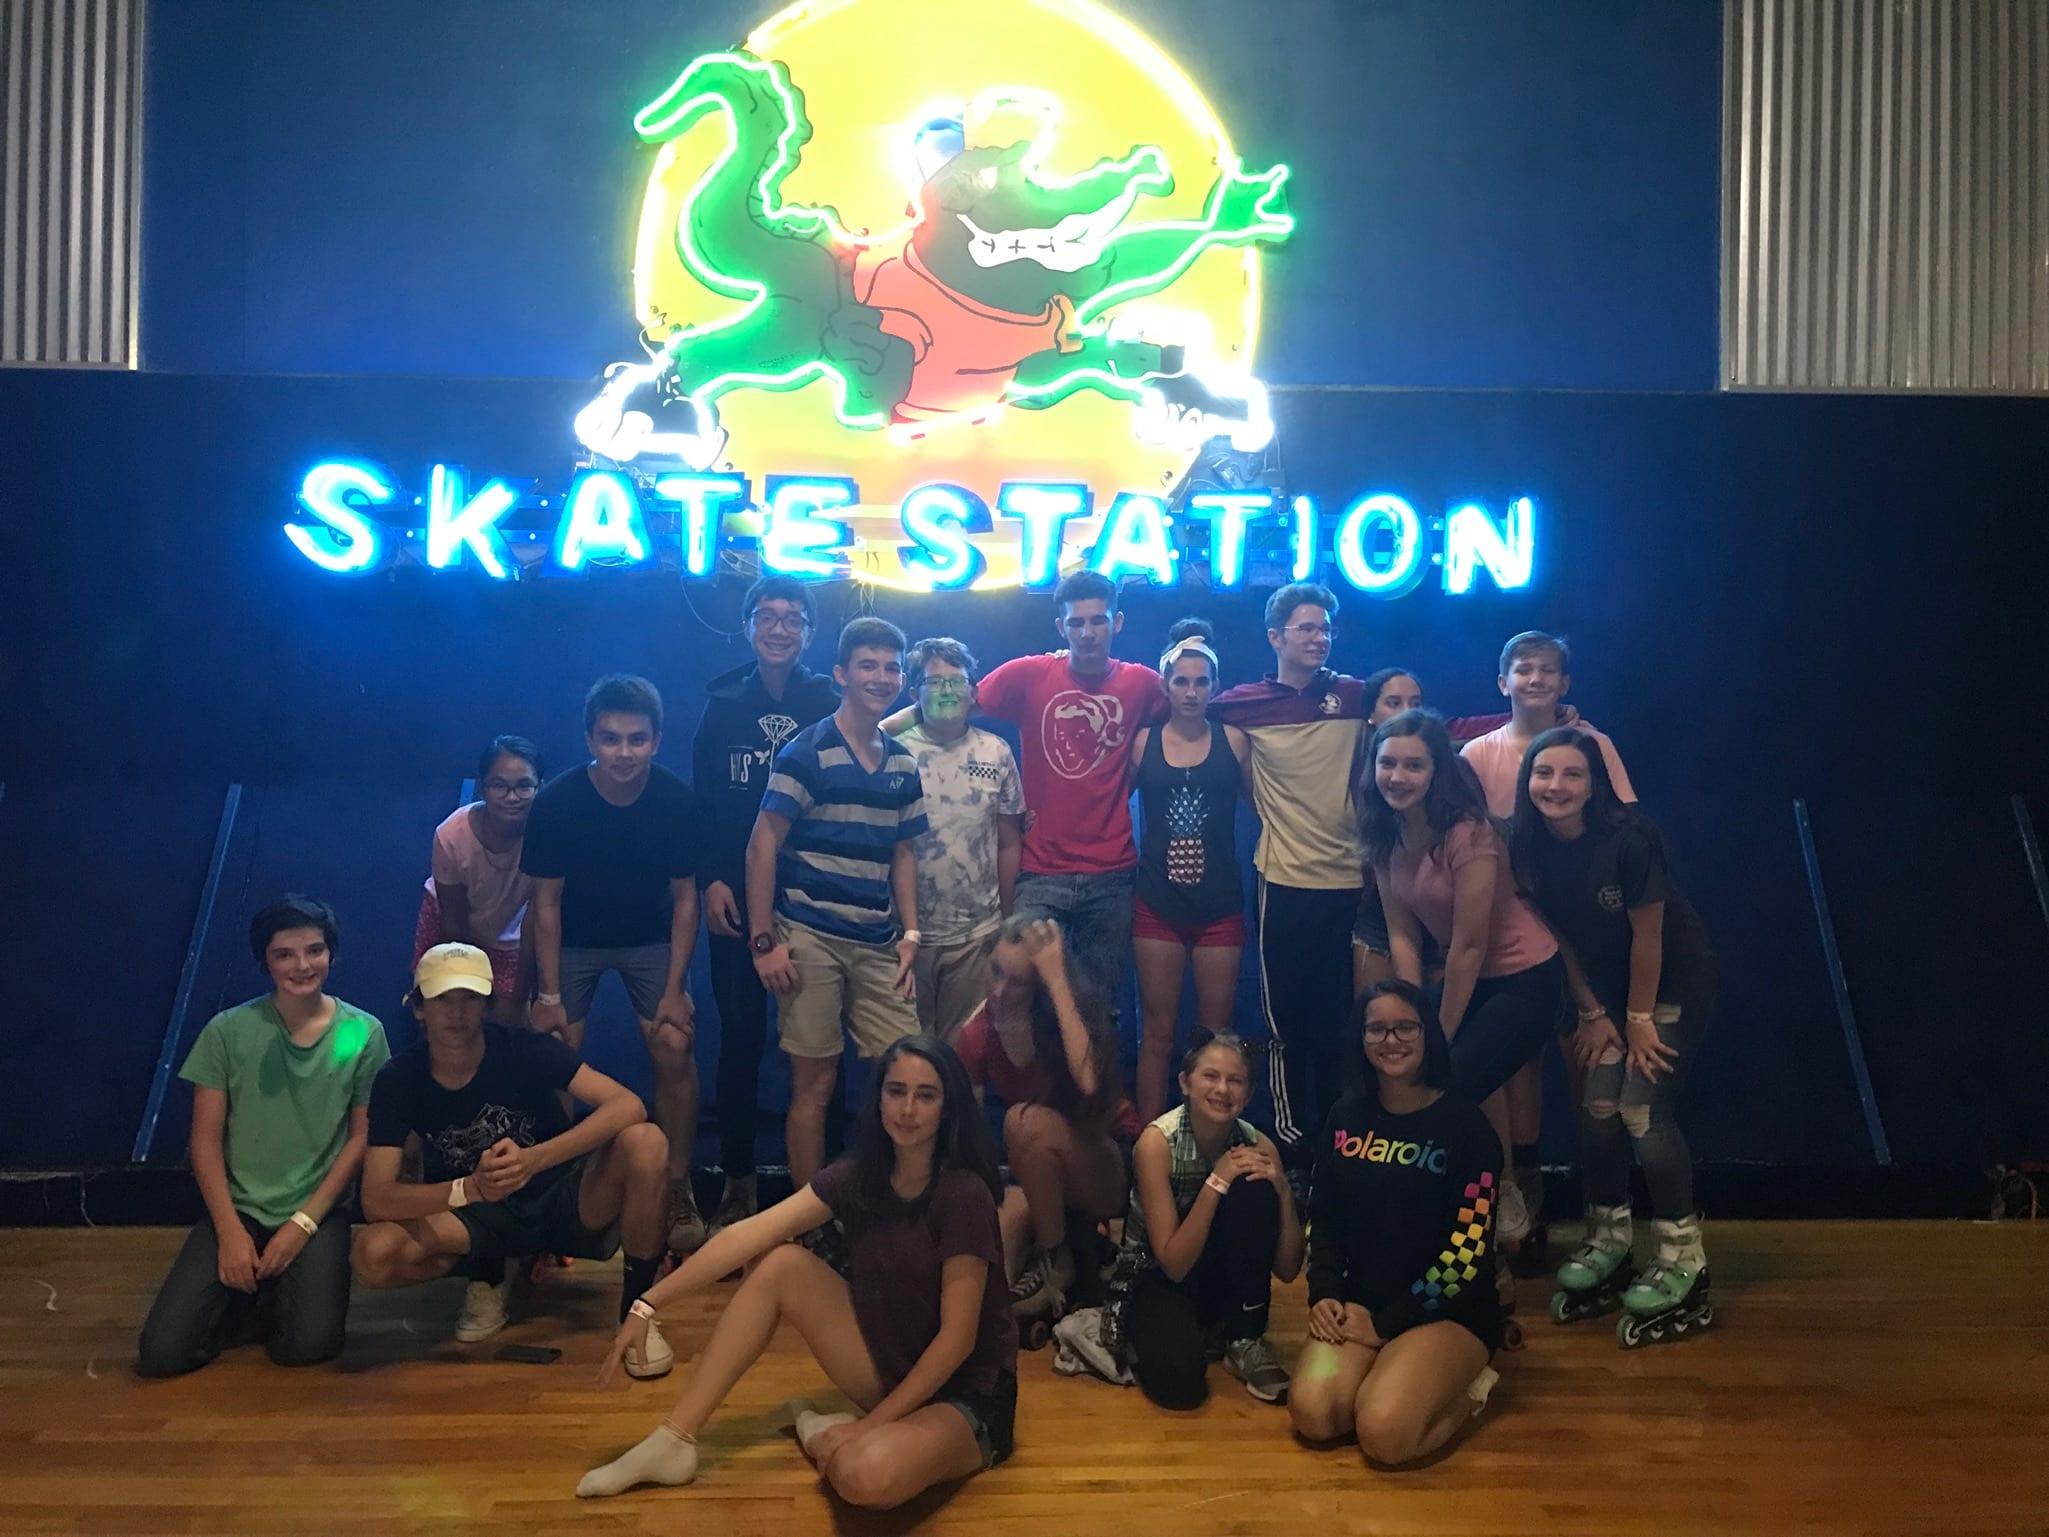 20190626 YM Skate Night Jun 12 Pic 2